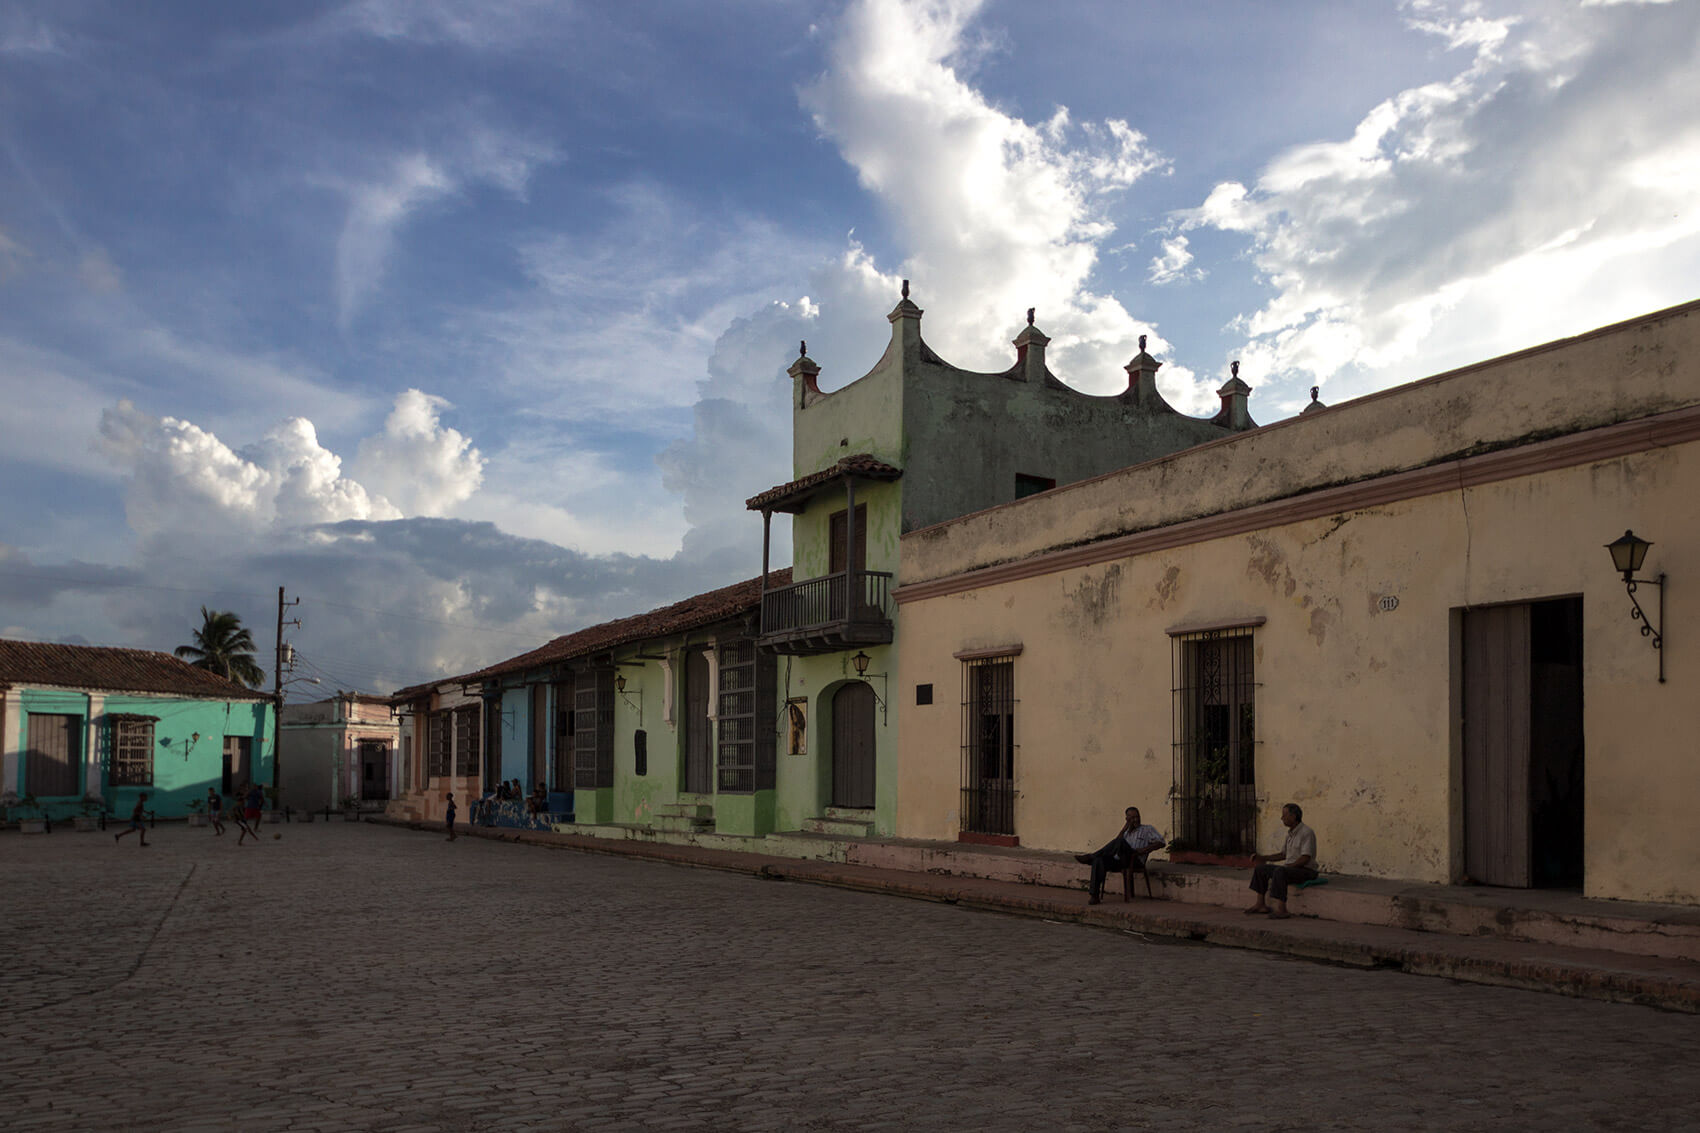 Close to sunset in Plaza San Juan de Dios, in Camagüey